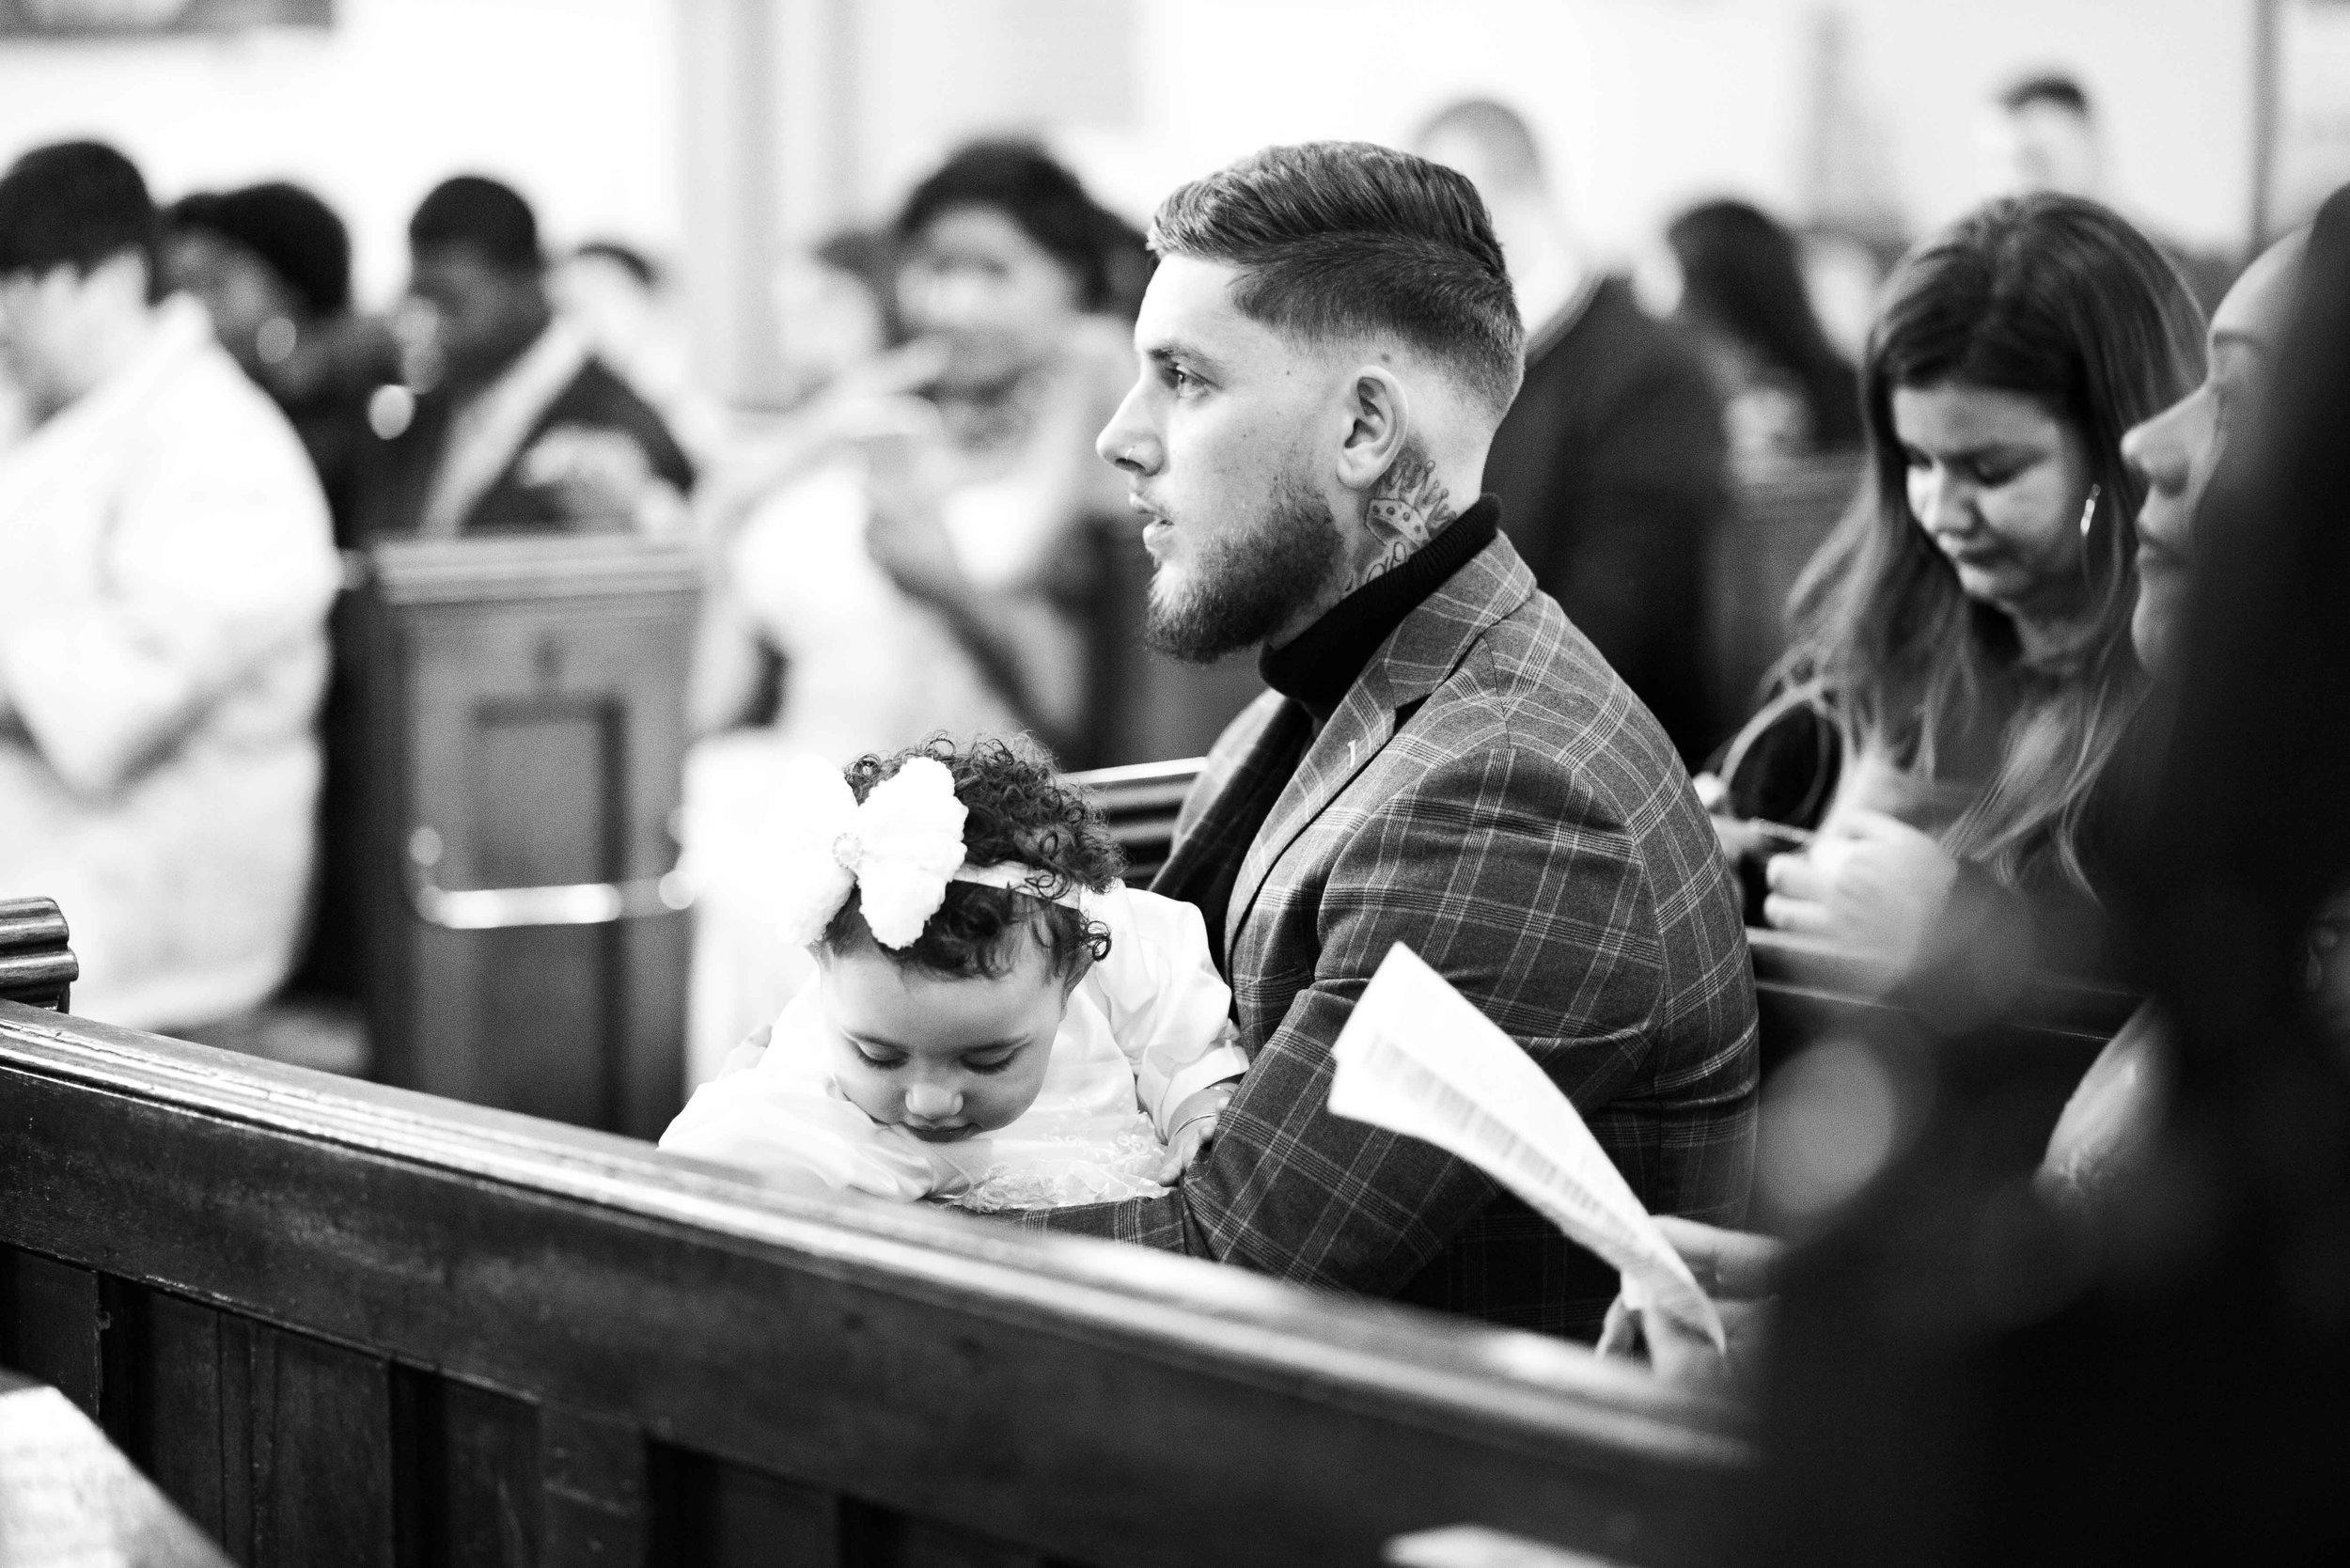 Lea-cooper-photography-christening-photographer-baptism-wolverhampton-wednesbury-walsall-willenhall-dudley-church-chapel-event-photography-11.jpg